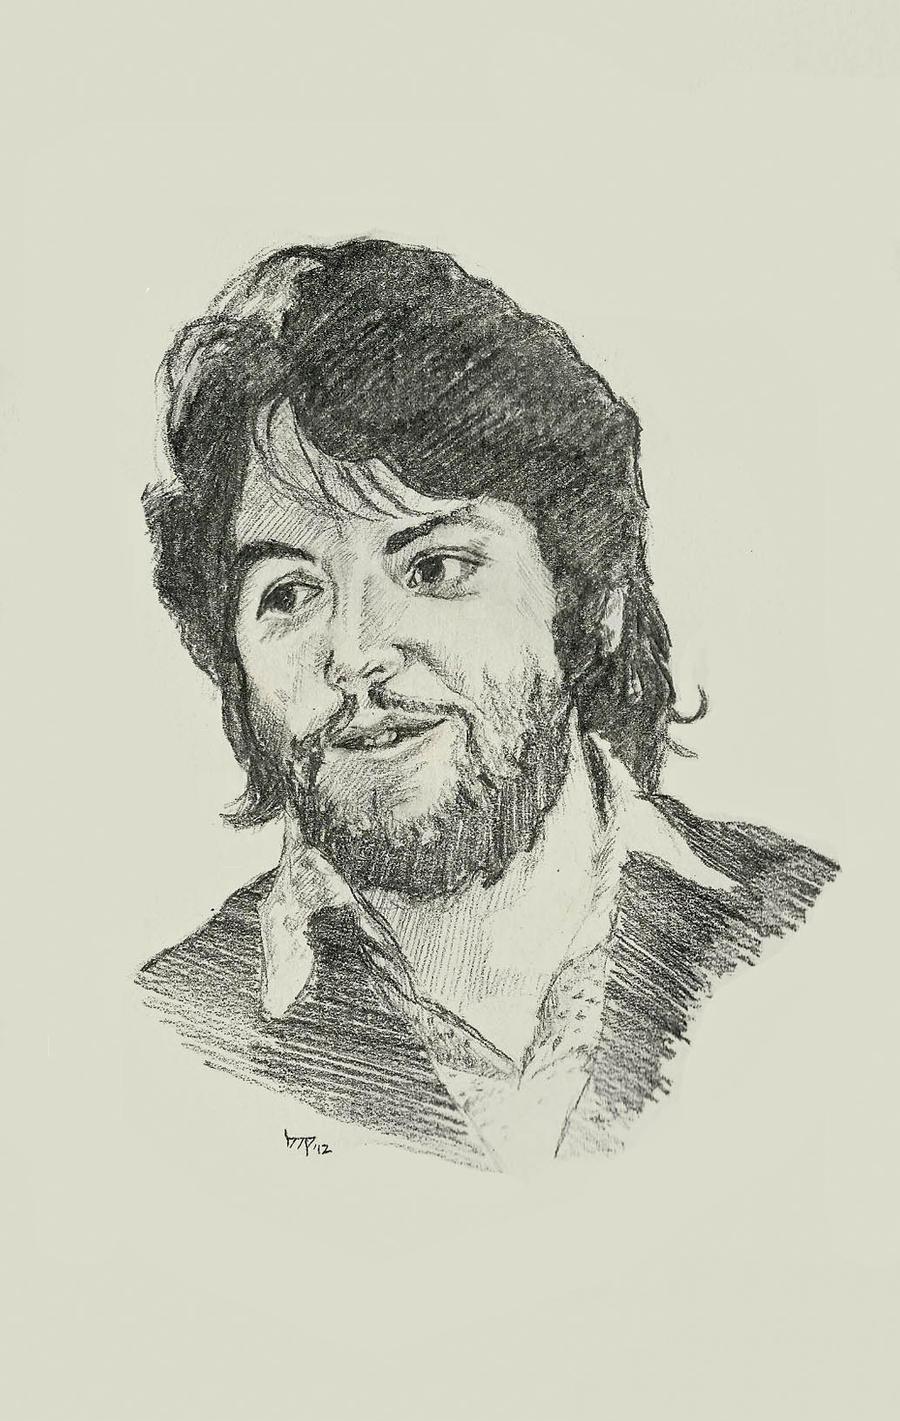 Paul McCartney by bensonput